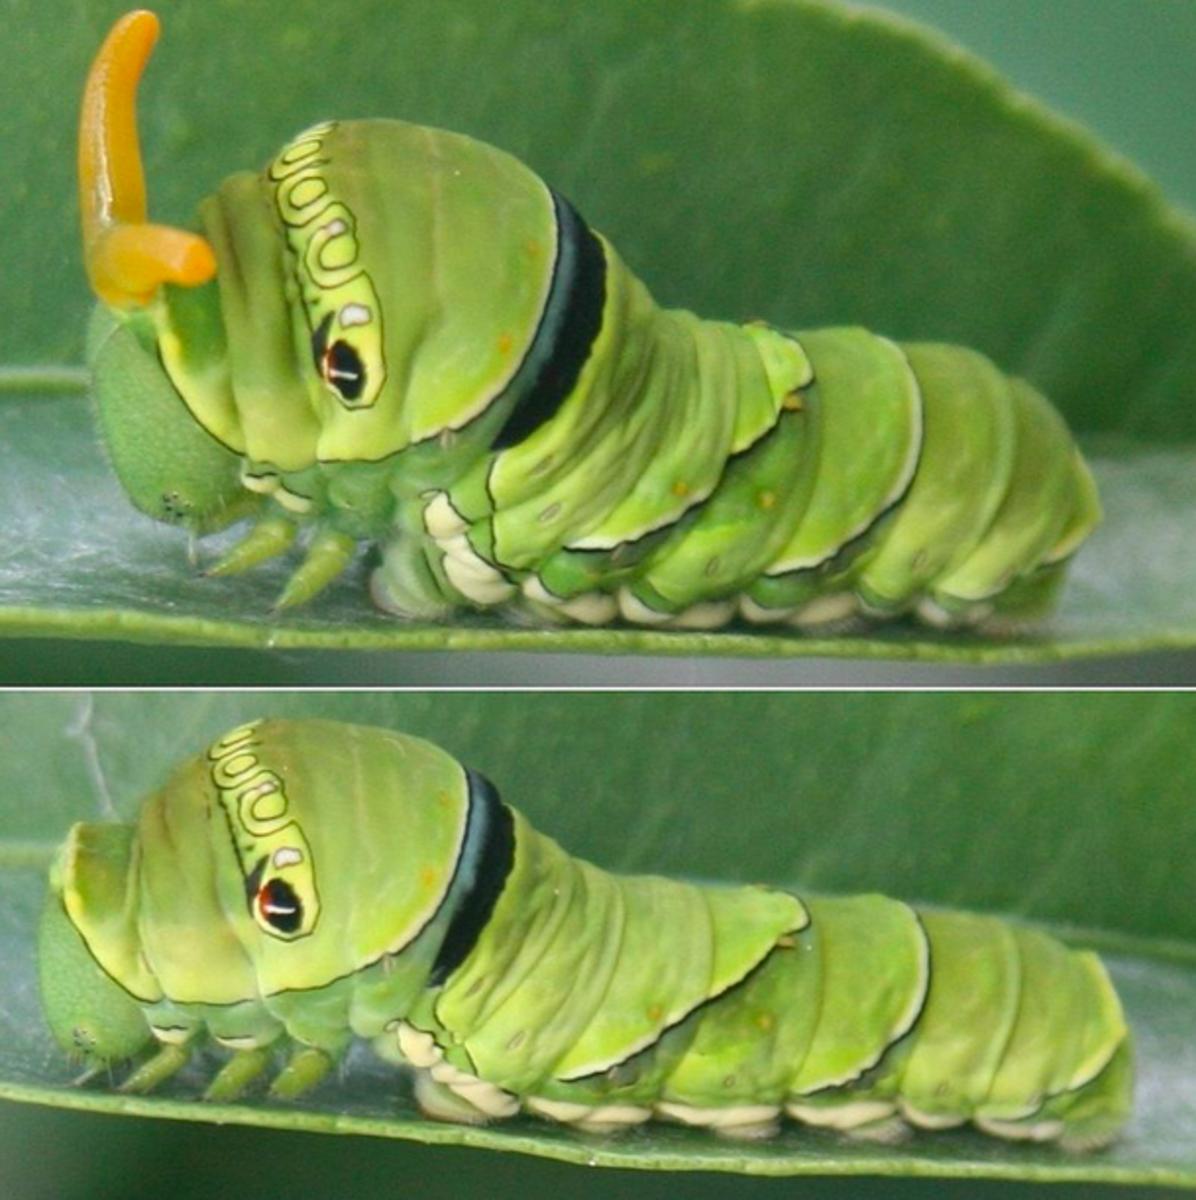 Swallowtail caterpillar showing the osmeterium (top)